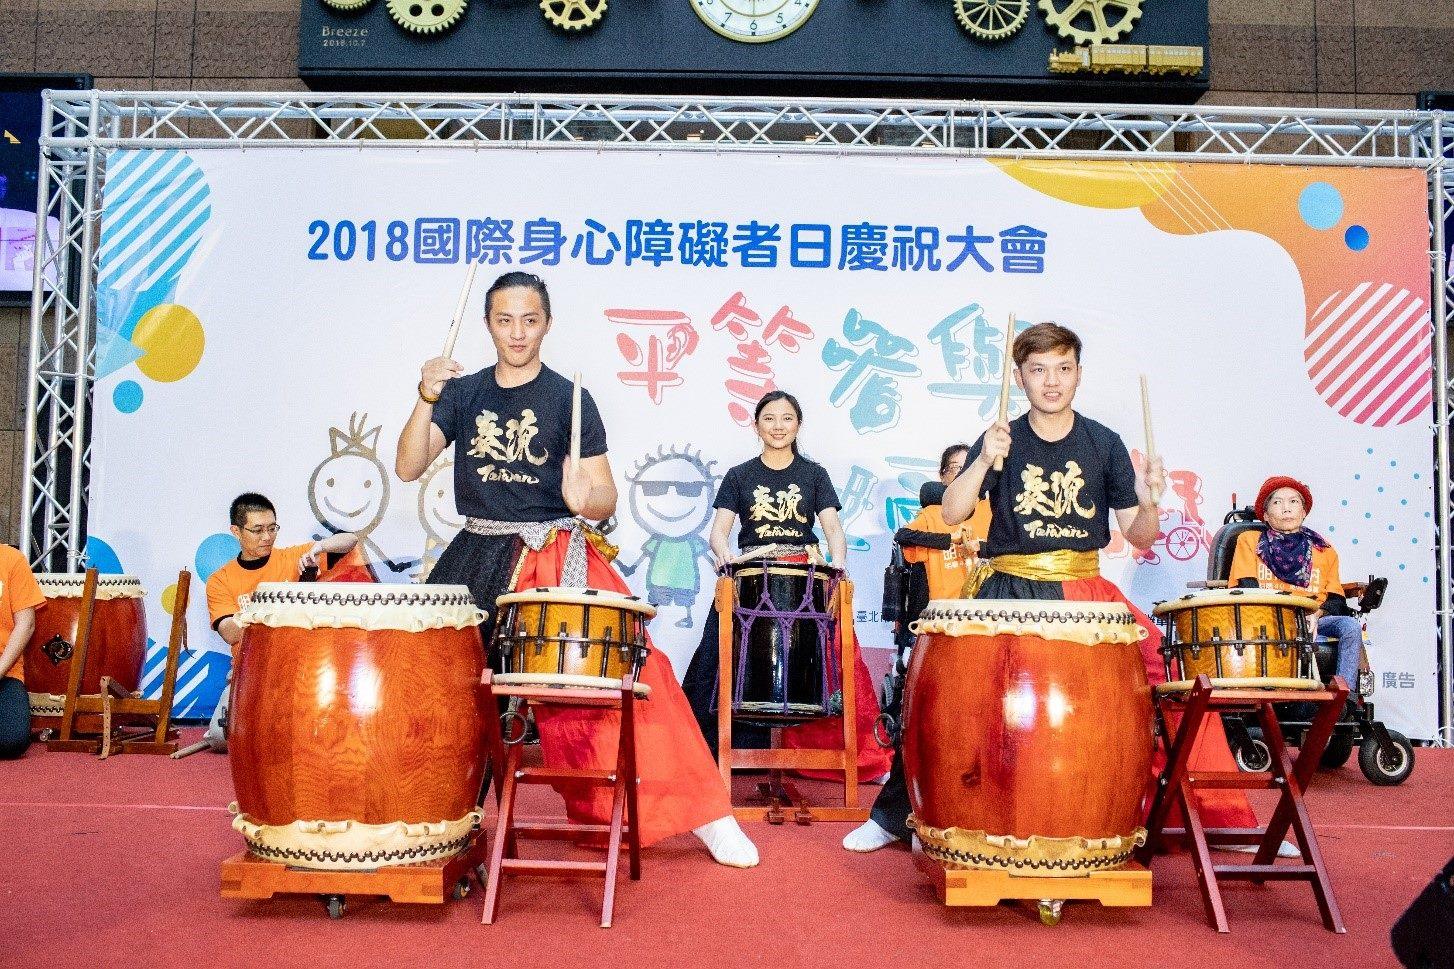 HARU太鼓團為下午一連串的表演精彩開場